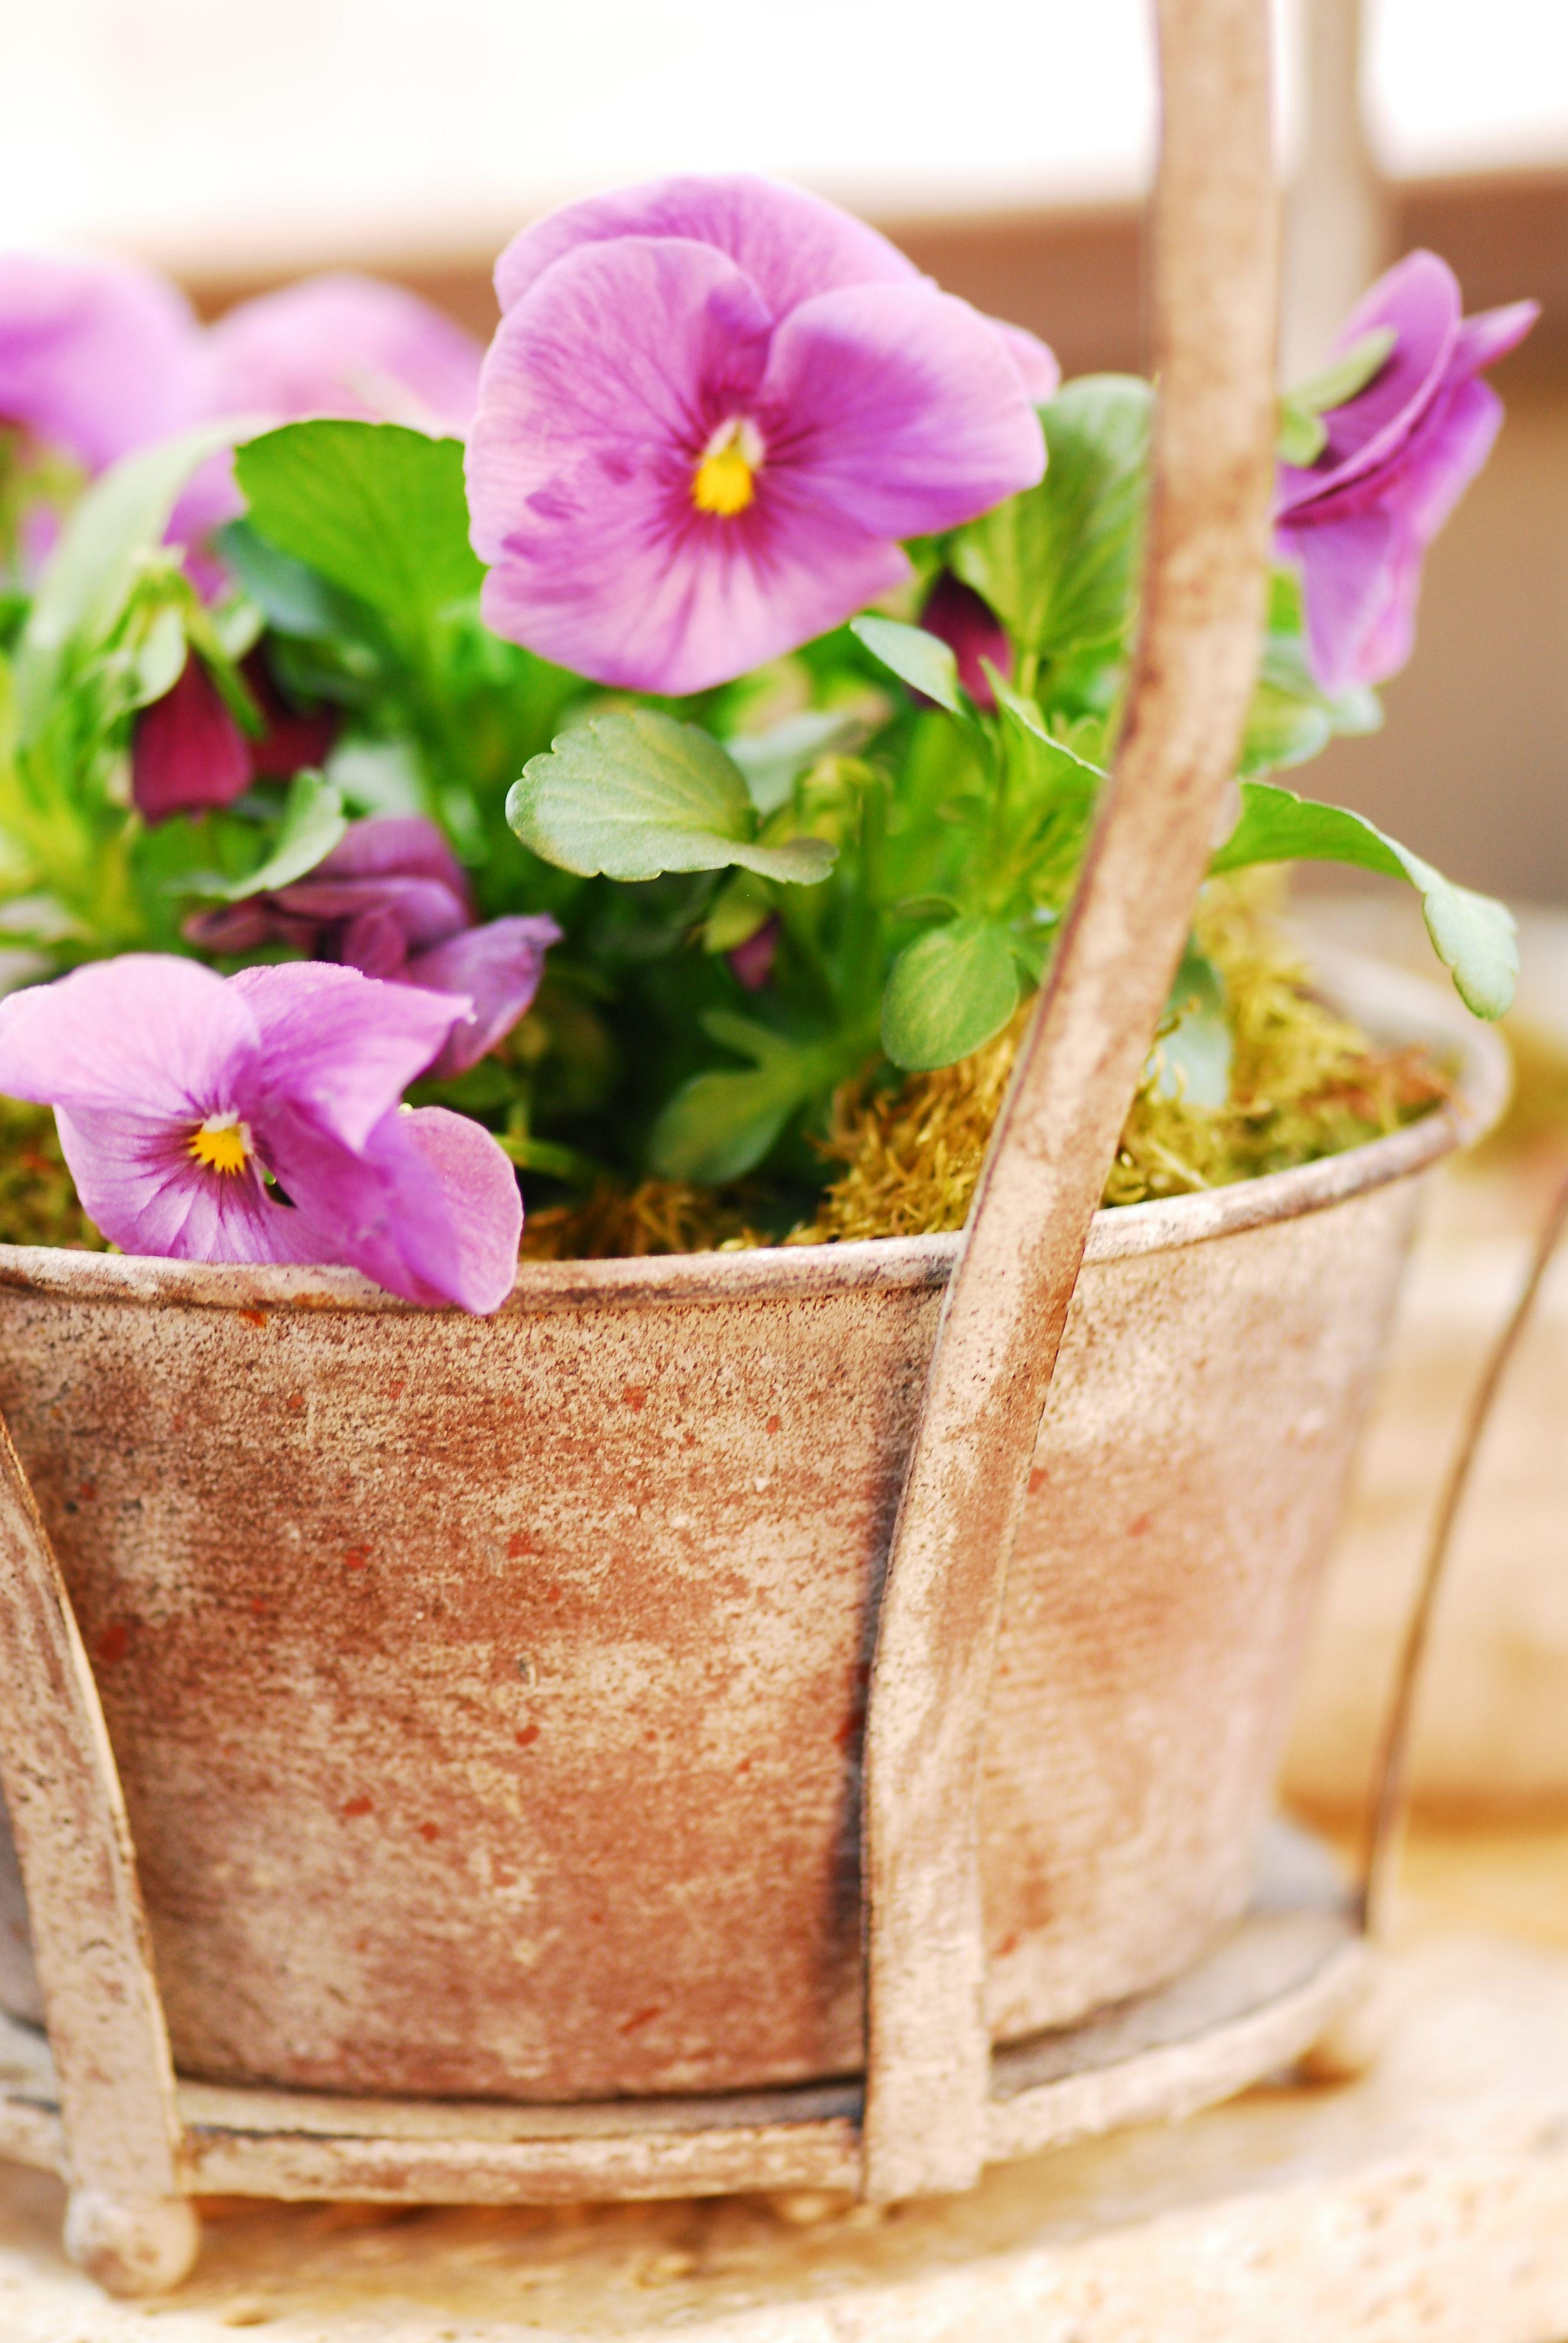 Garten Pflanzen Frühling Dekoration Shabby Chic & Vintage Lebensart